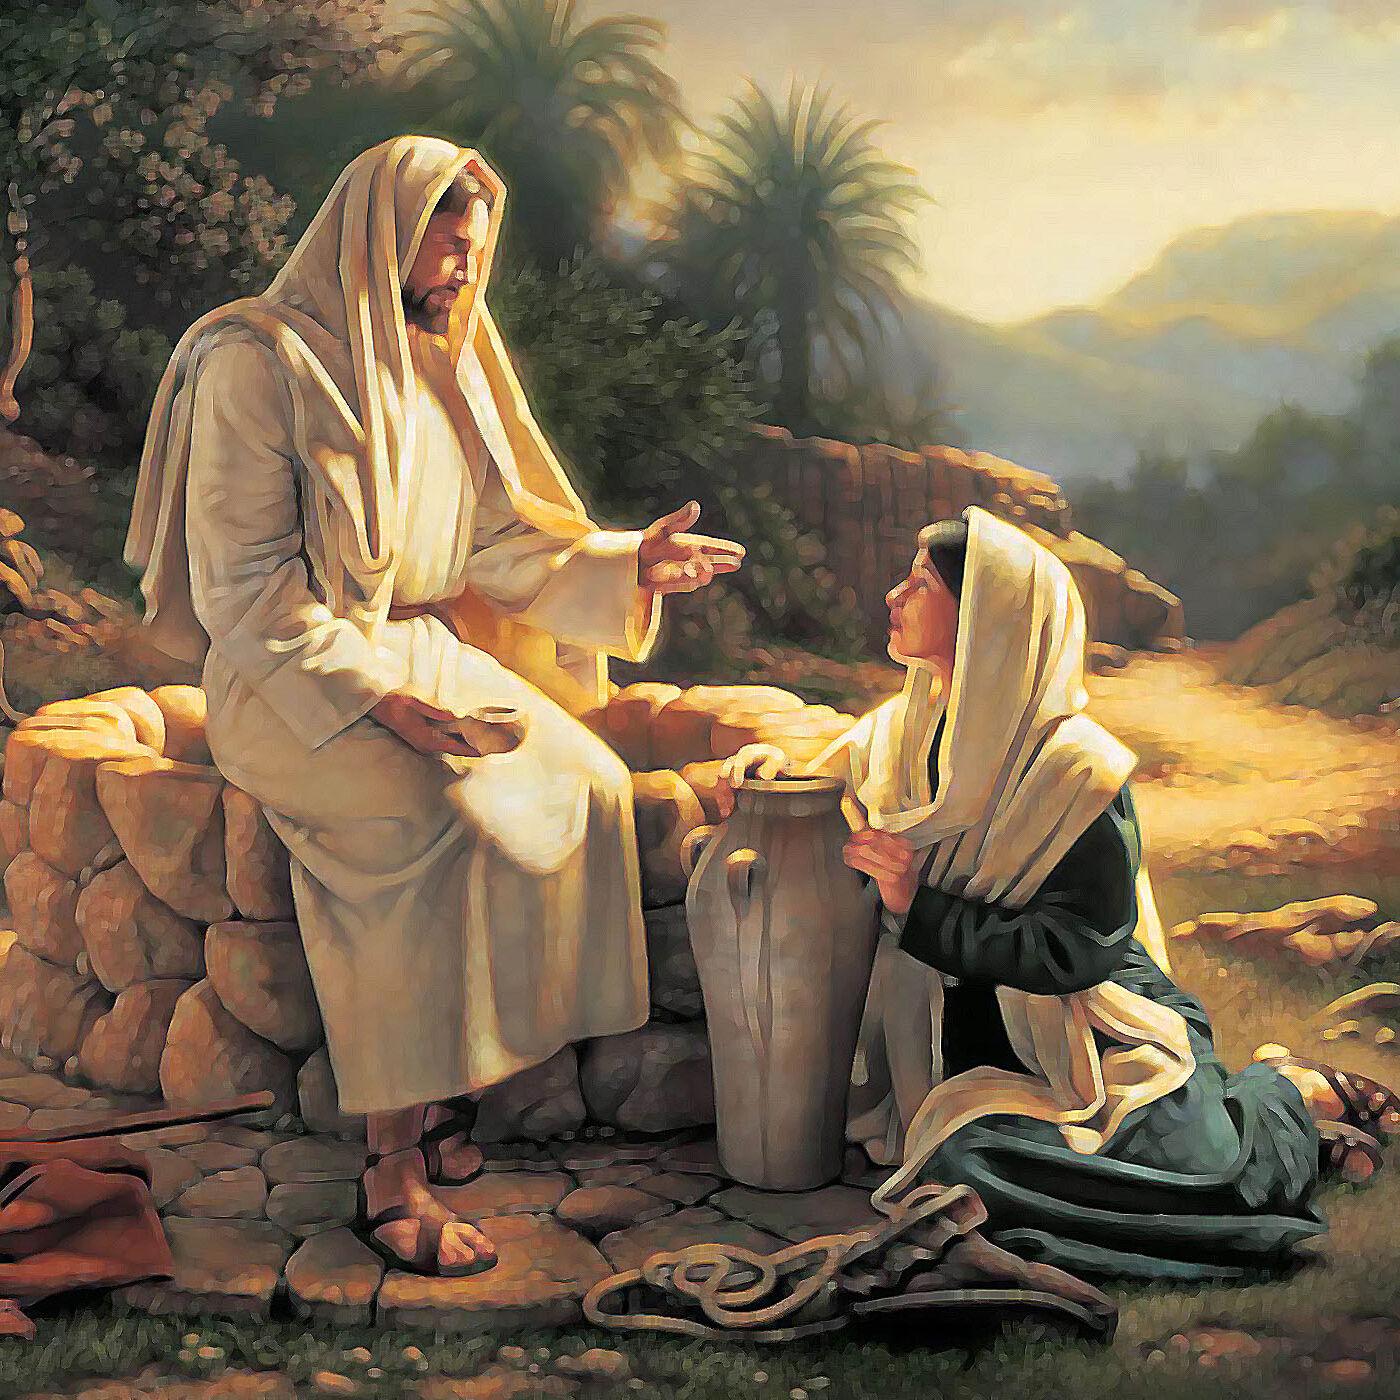 riflessioni sul Vangelo di Lunedì 4 Gennaio 2021 (Gv 1, 35-42) - Apostola Briana